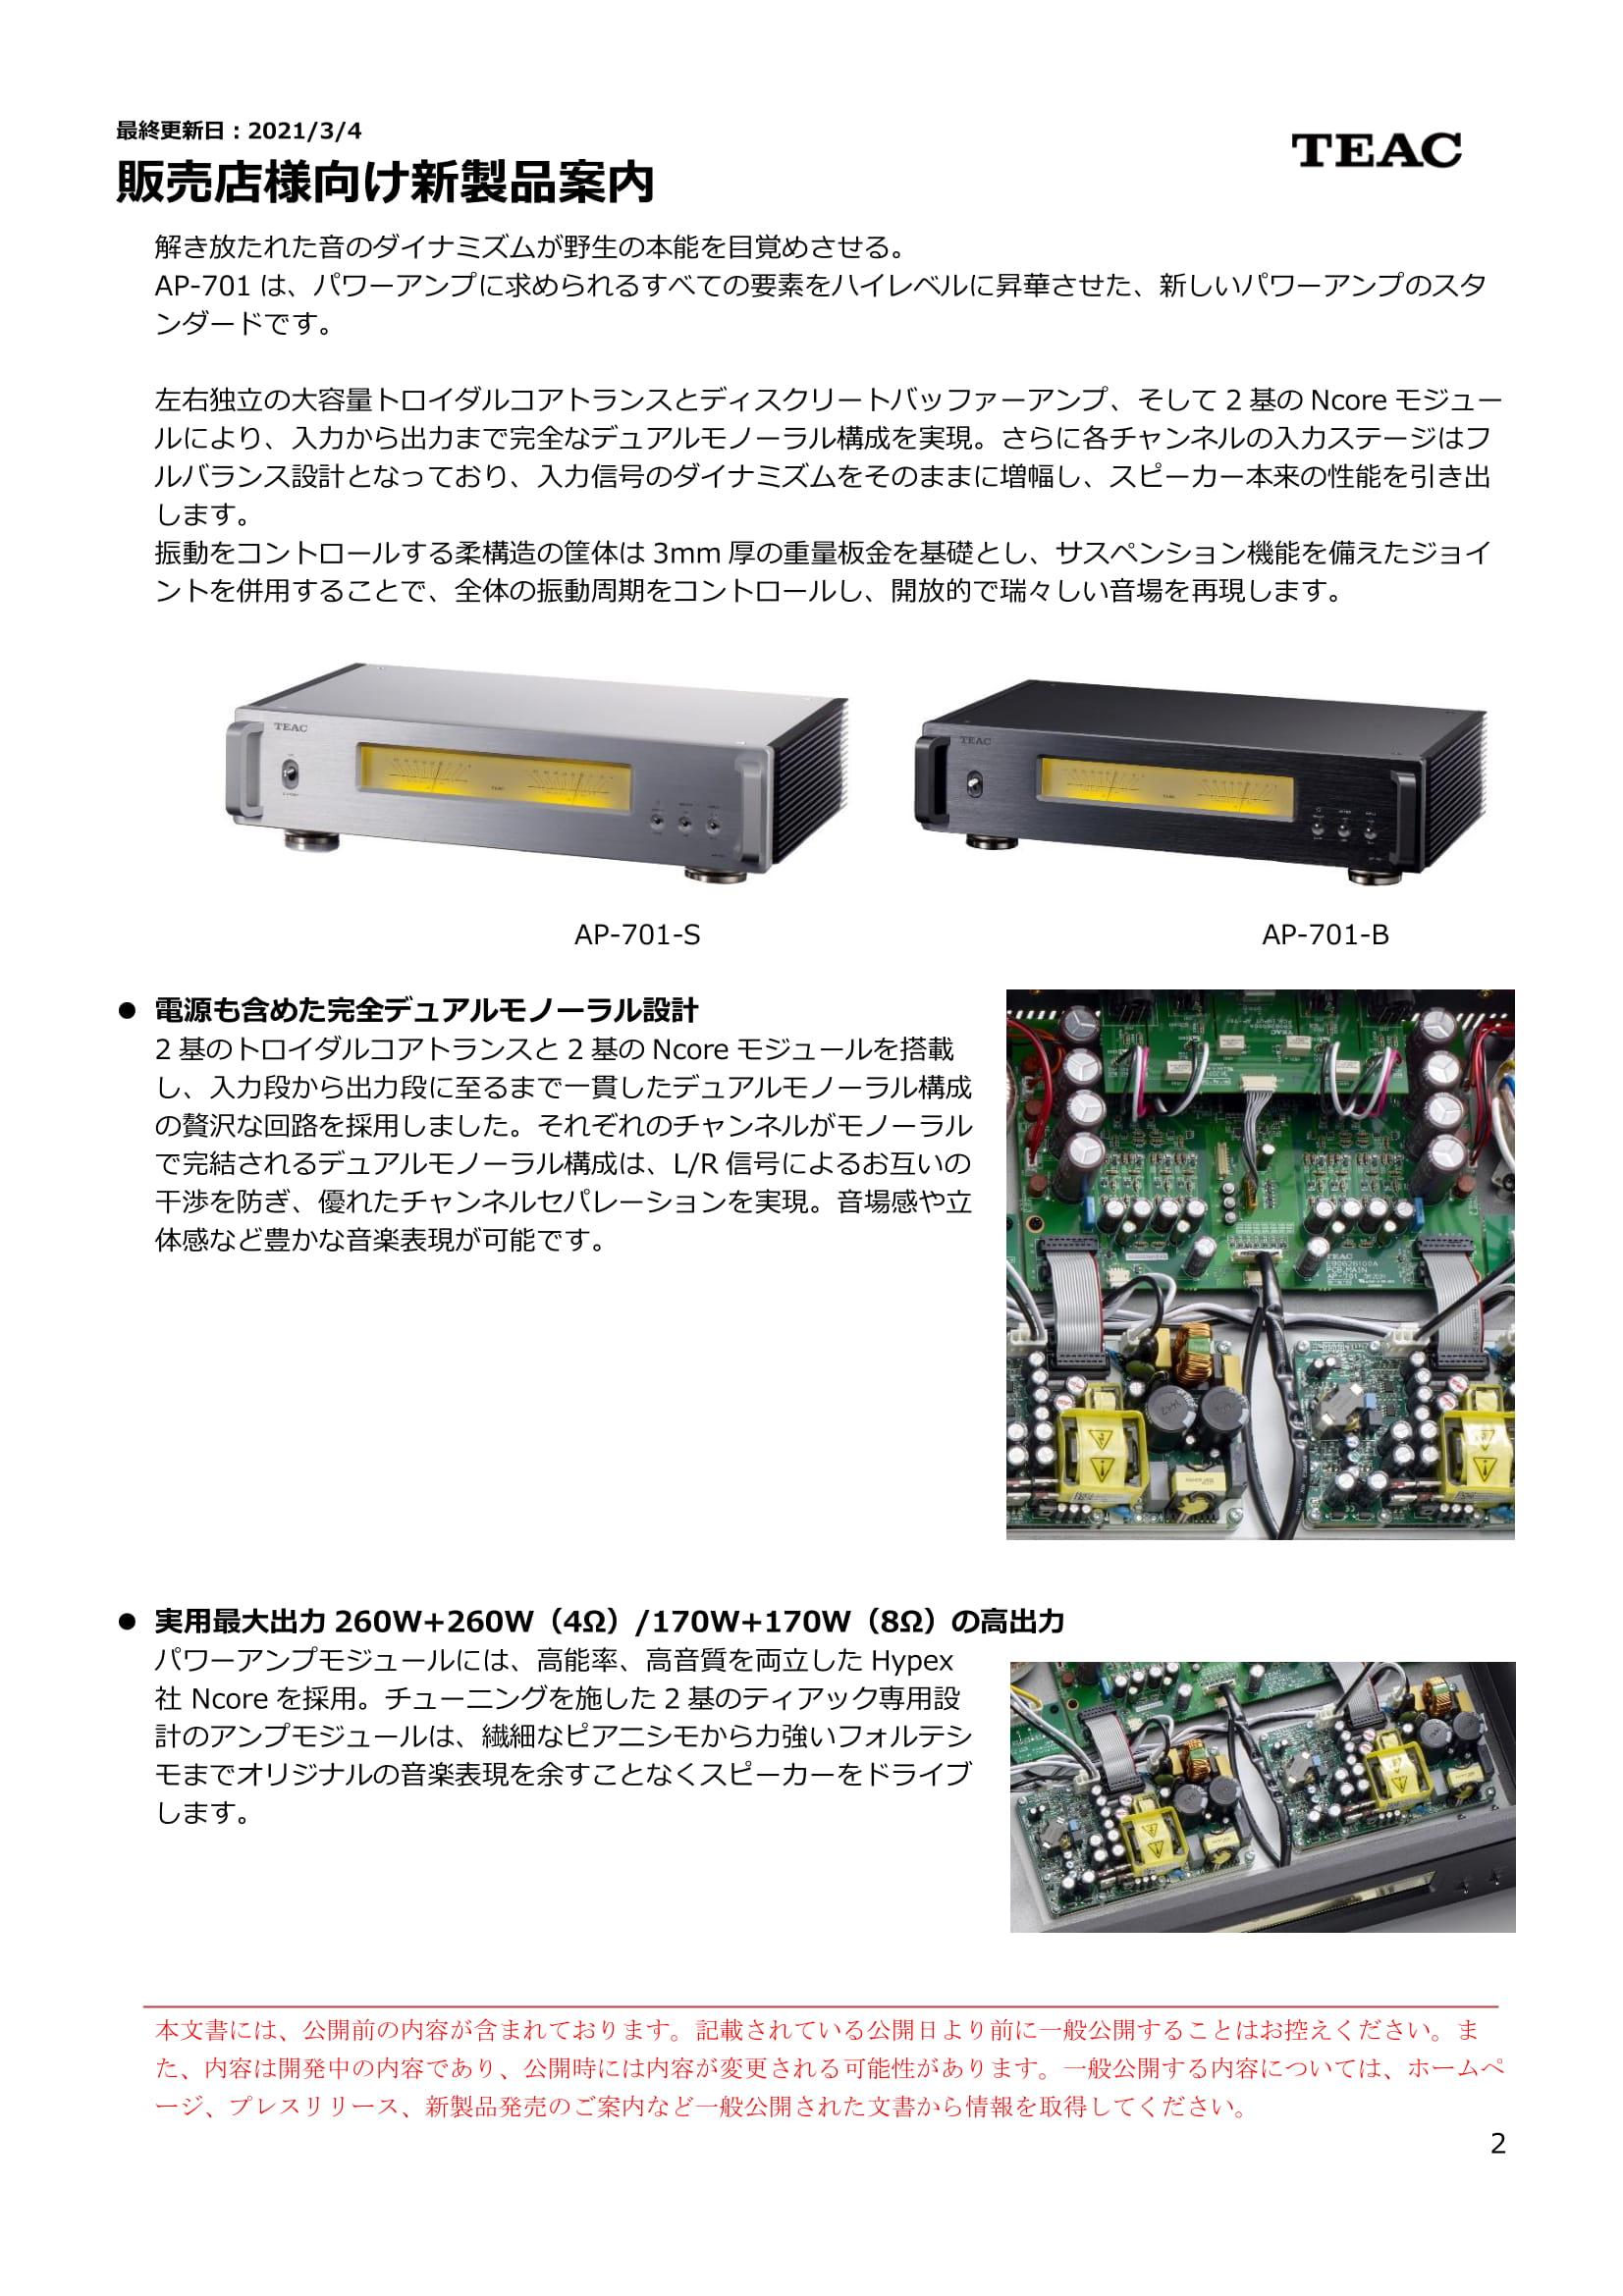 AP-701_SNPI_210304-2.jpg